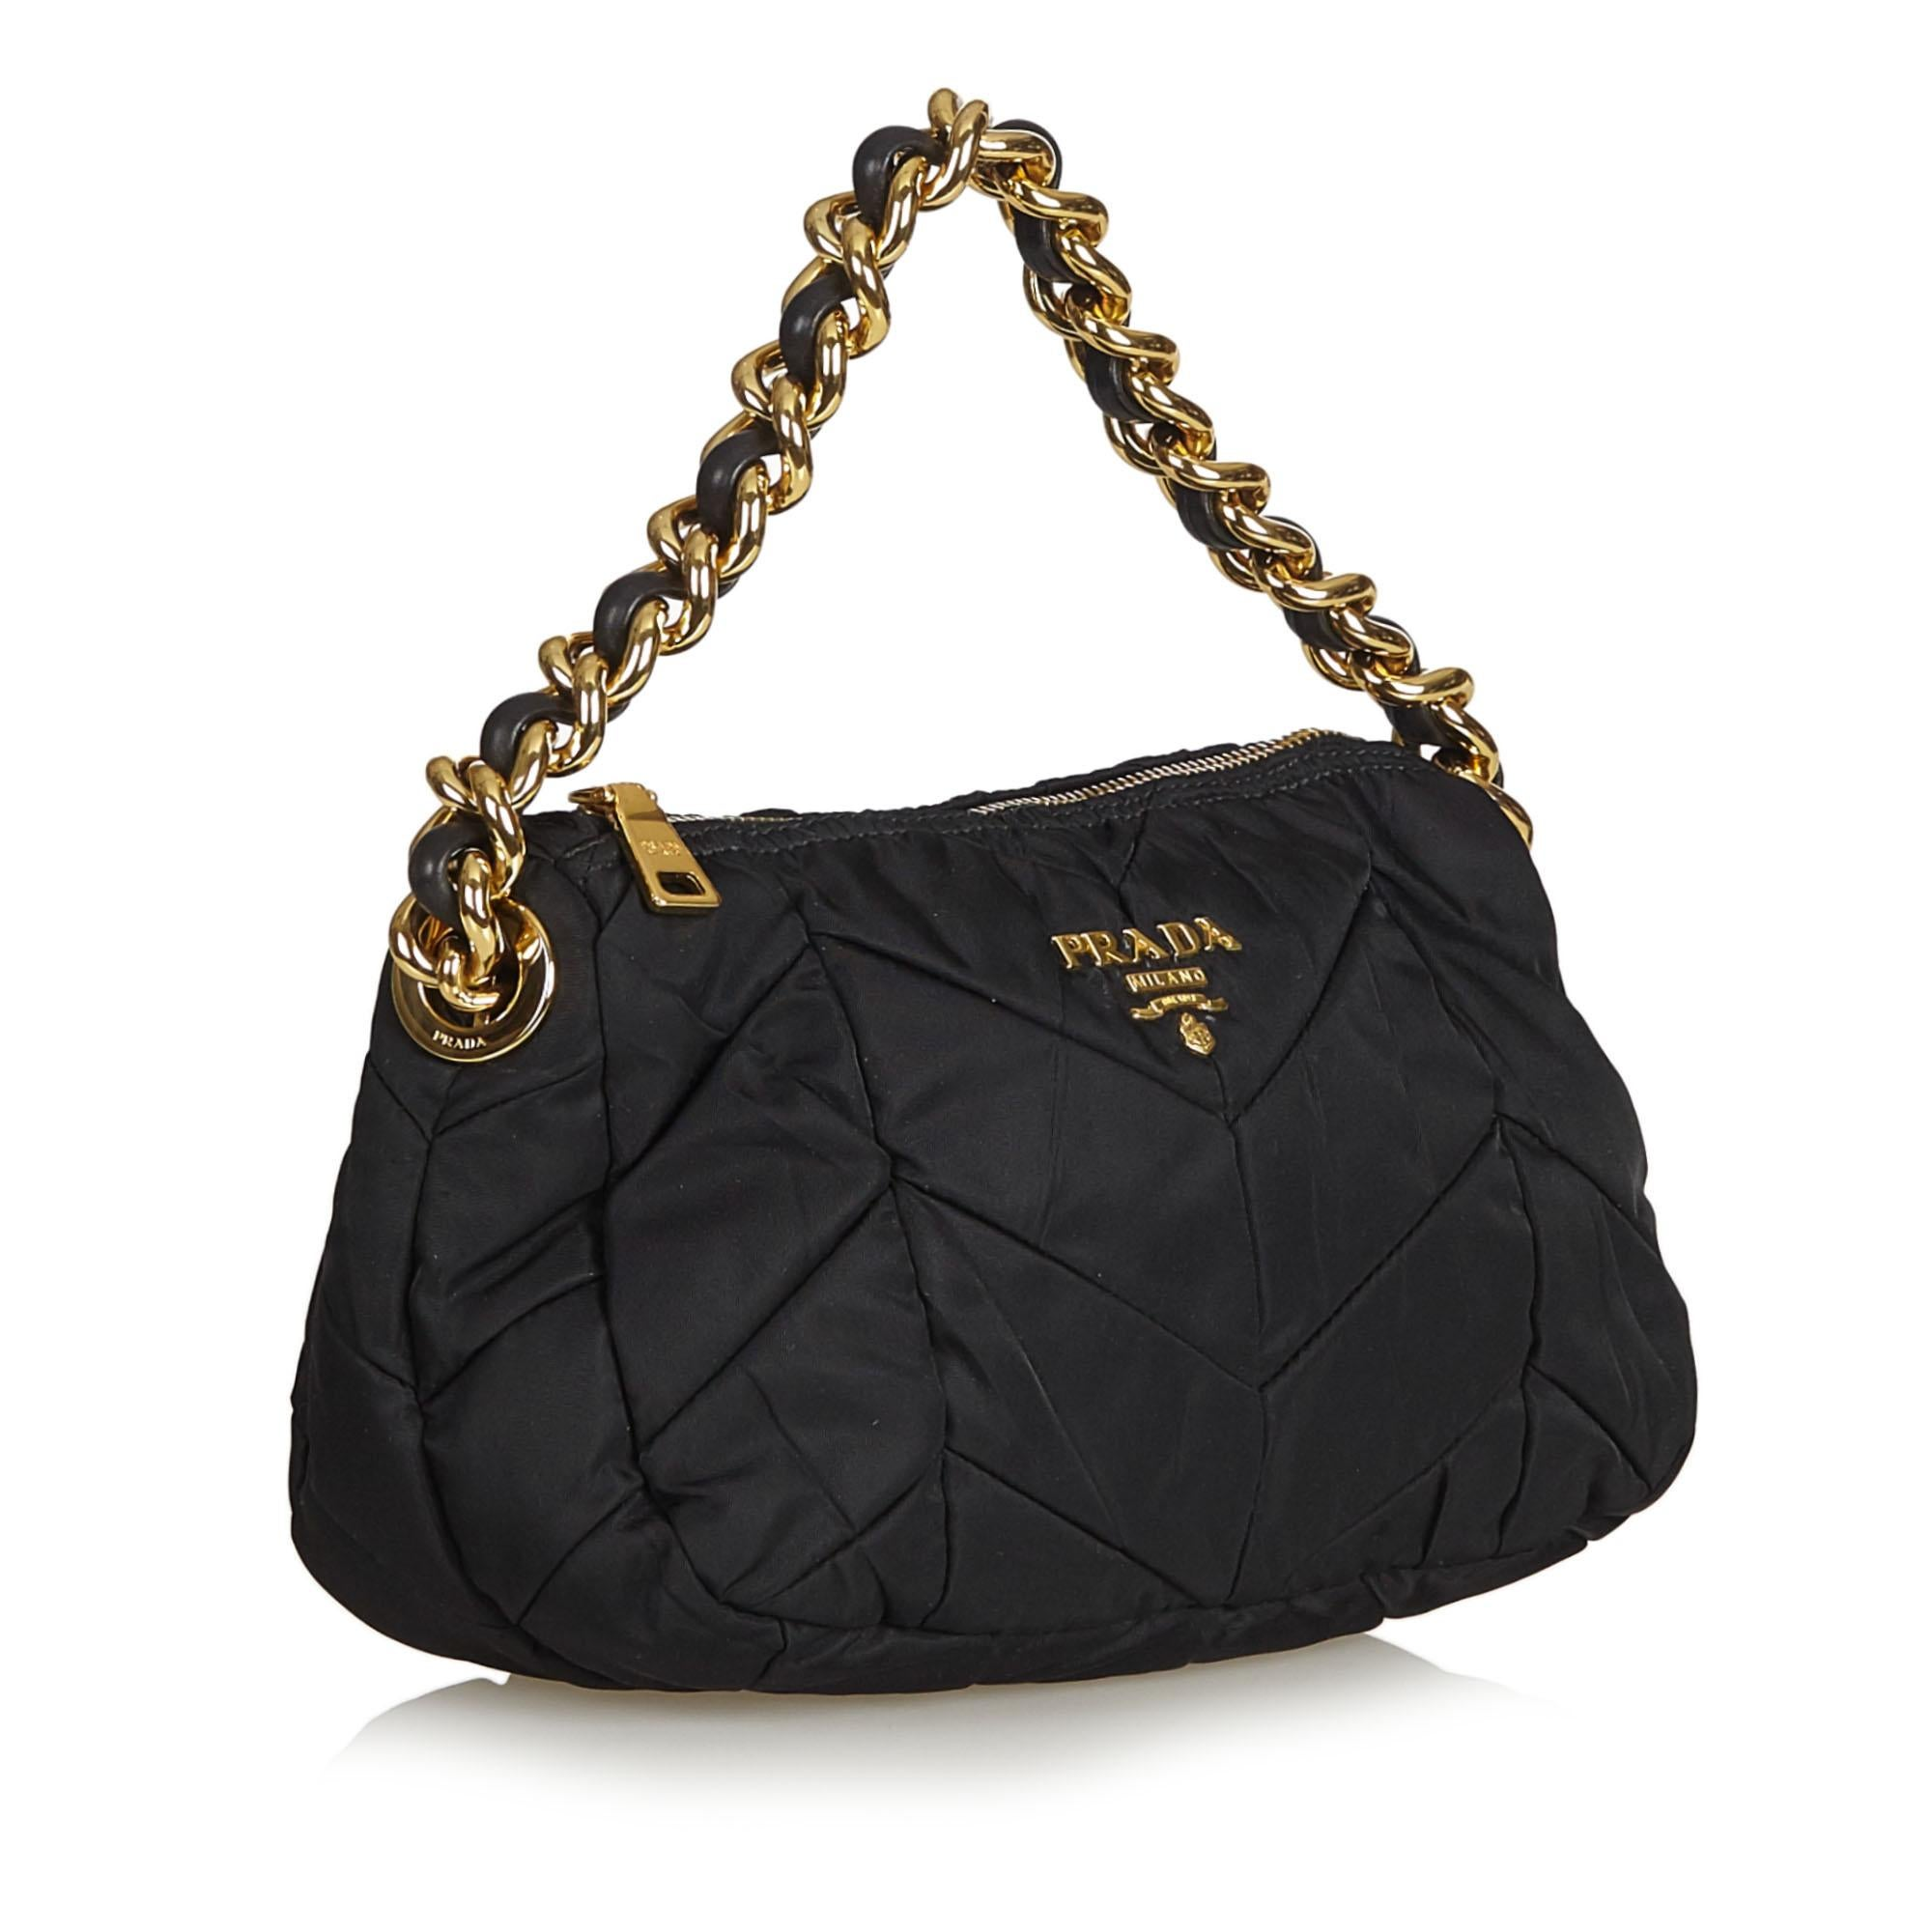 47981ce711f6 Prada Black Quilted Nylon Chain Shoulder Bag at 1stdibs